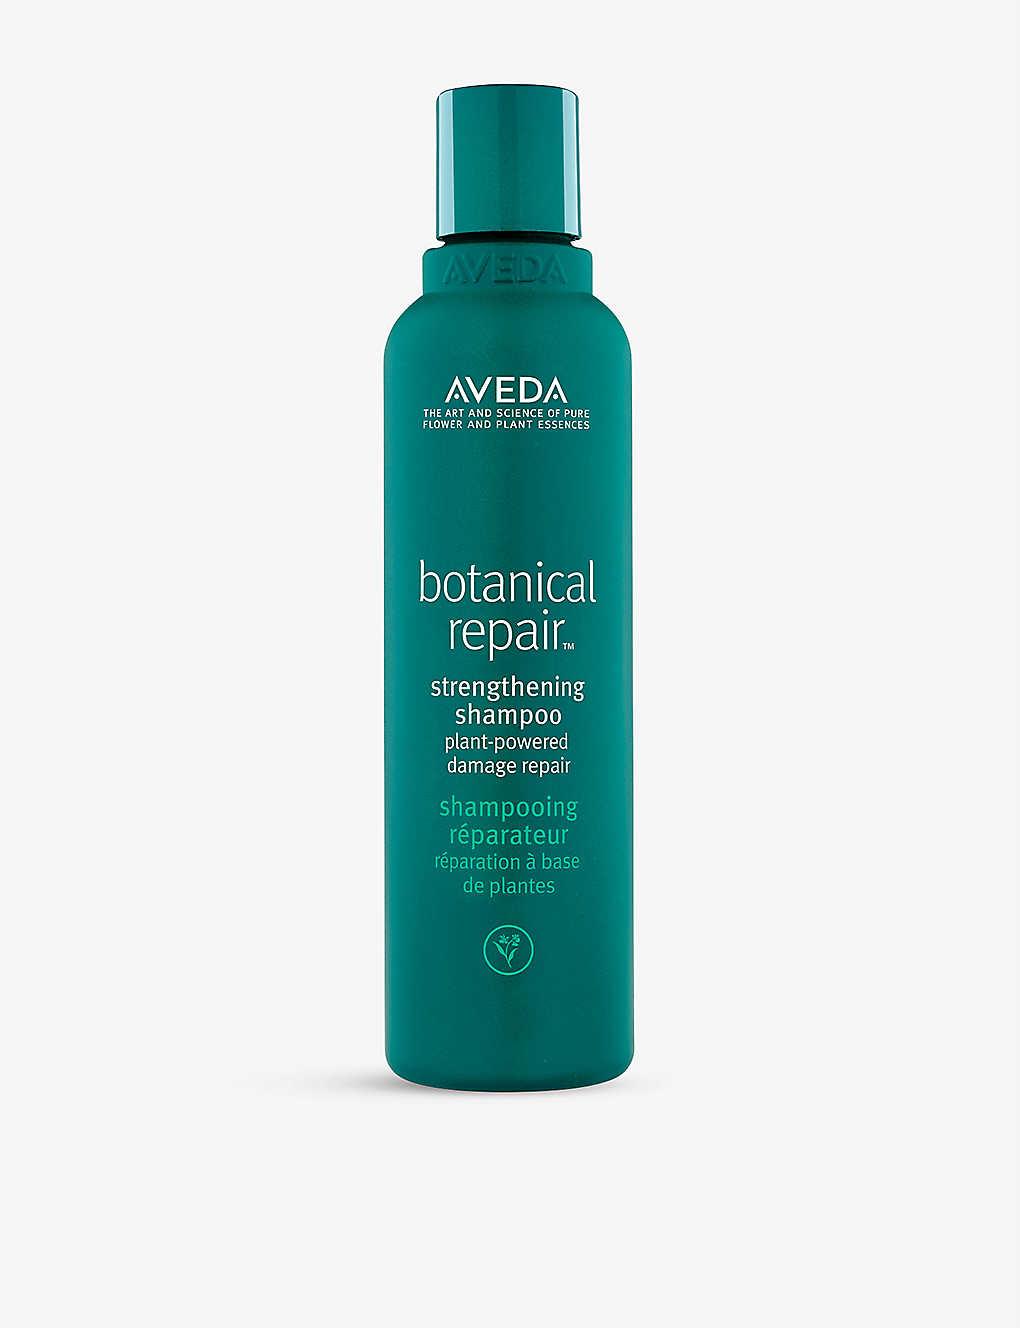 AVEDA: botanical repair™ strengthening shampoo 200ml